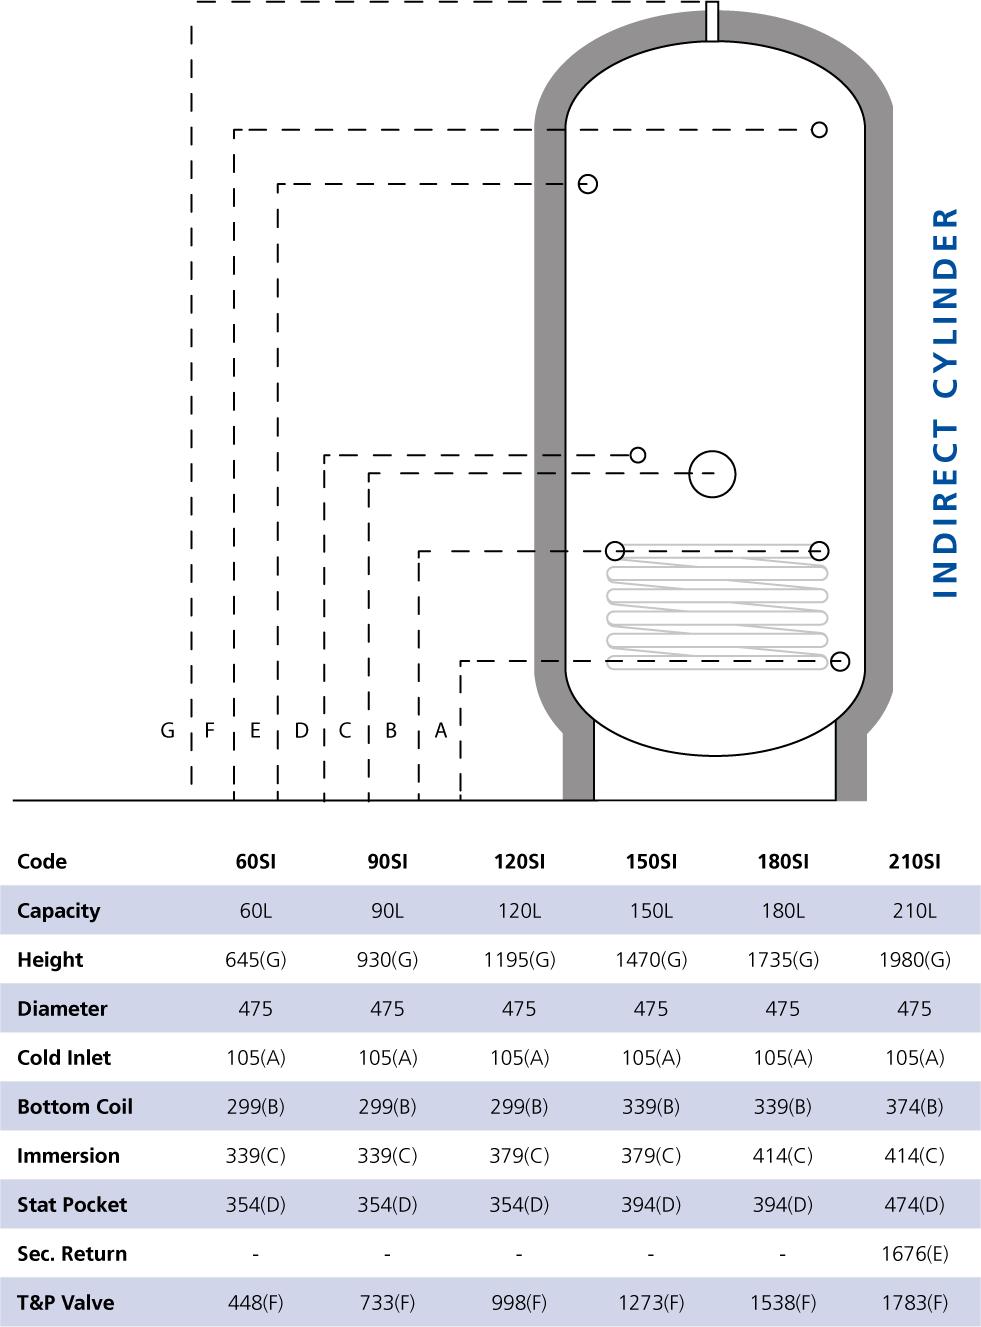 slimline-diagram1.png